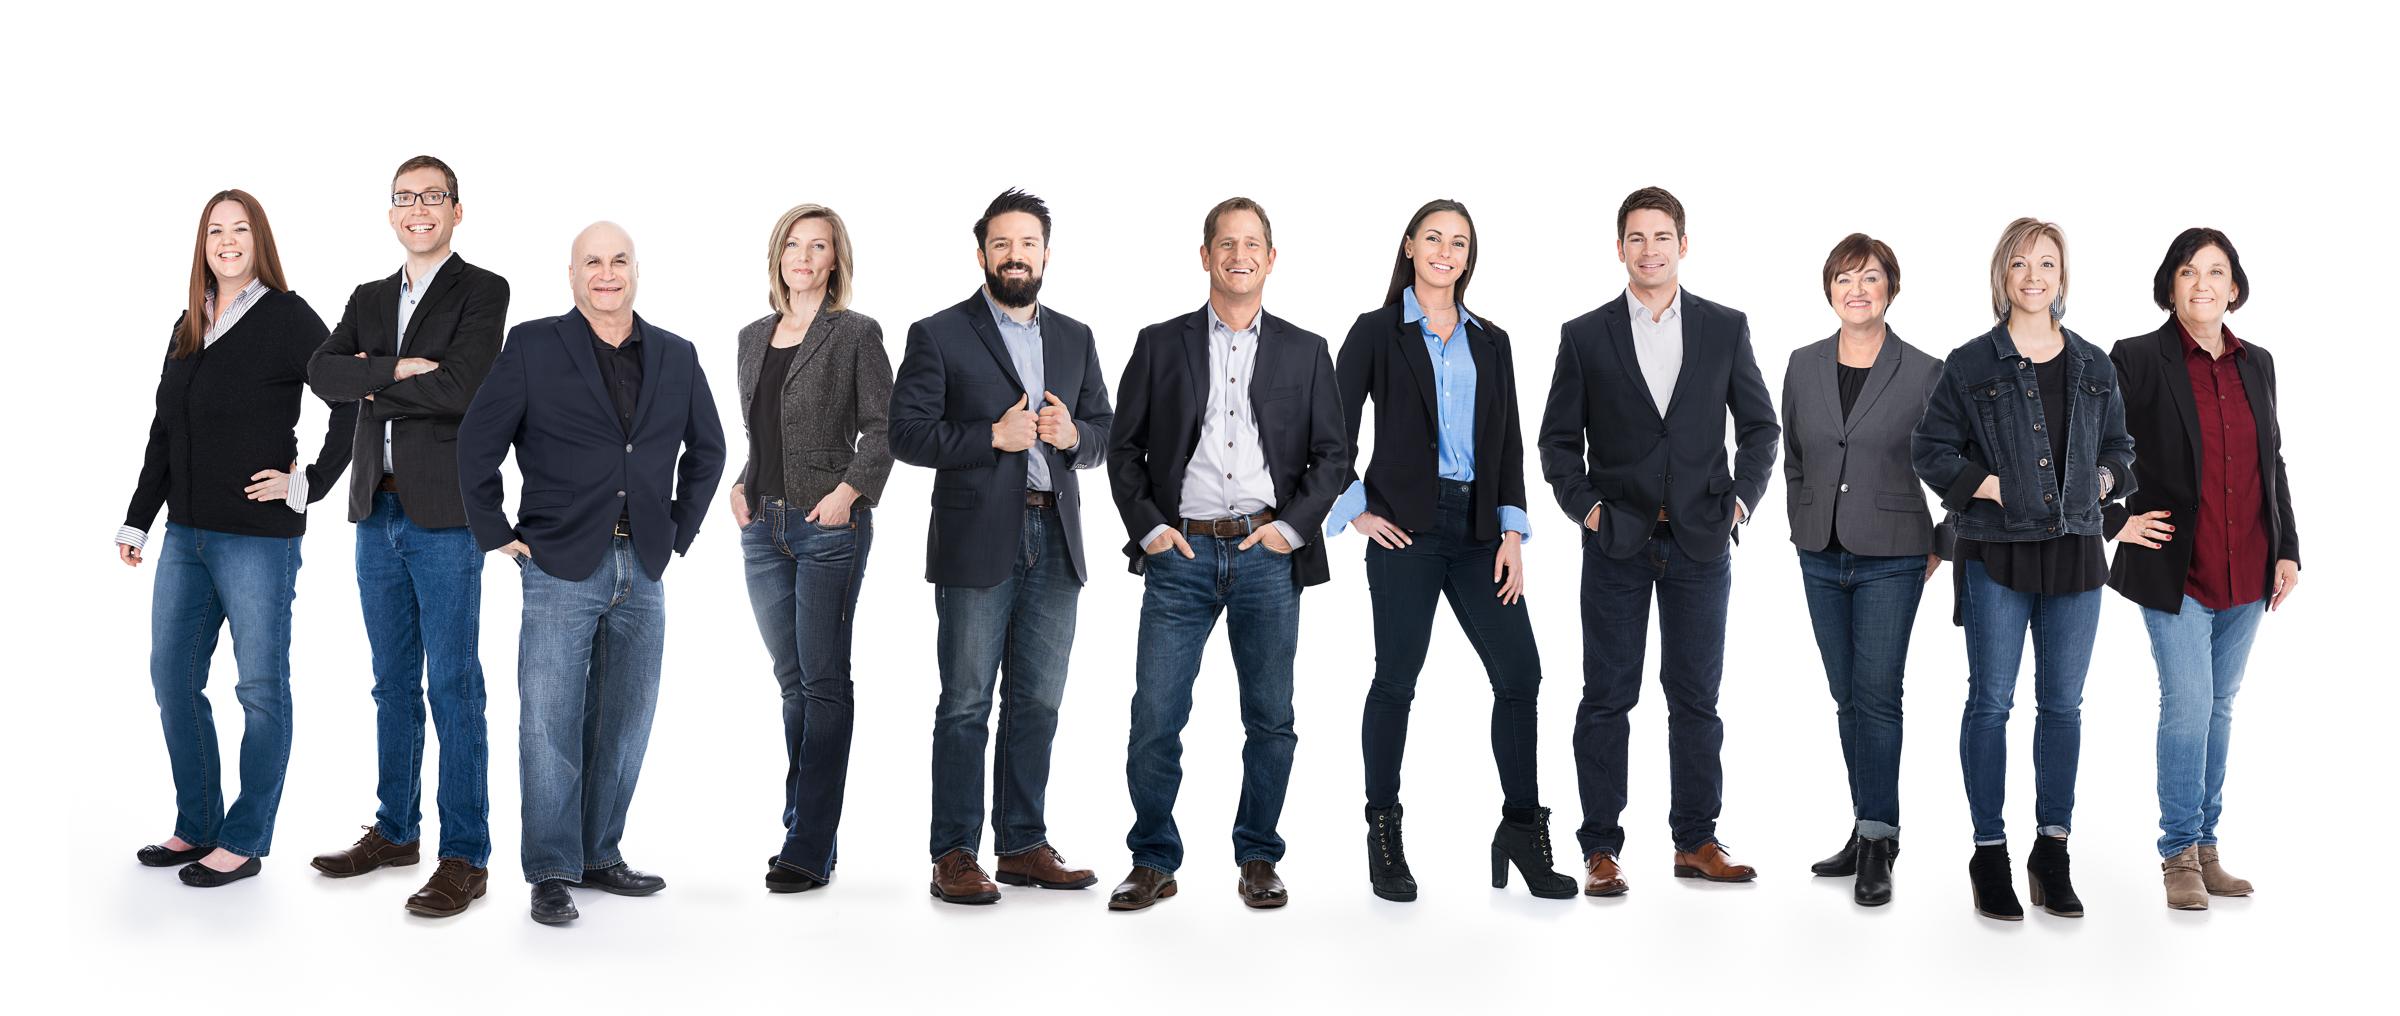 Boise corporate headshot photographer group portrait